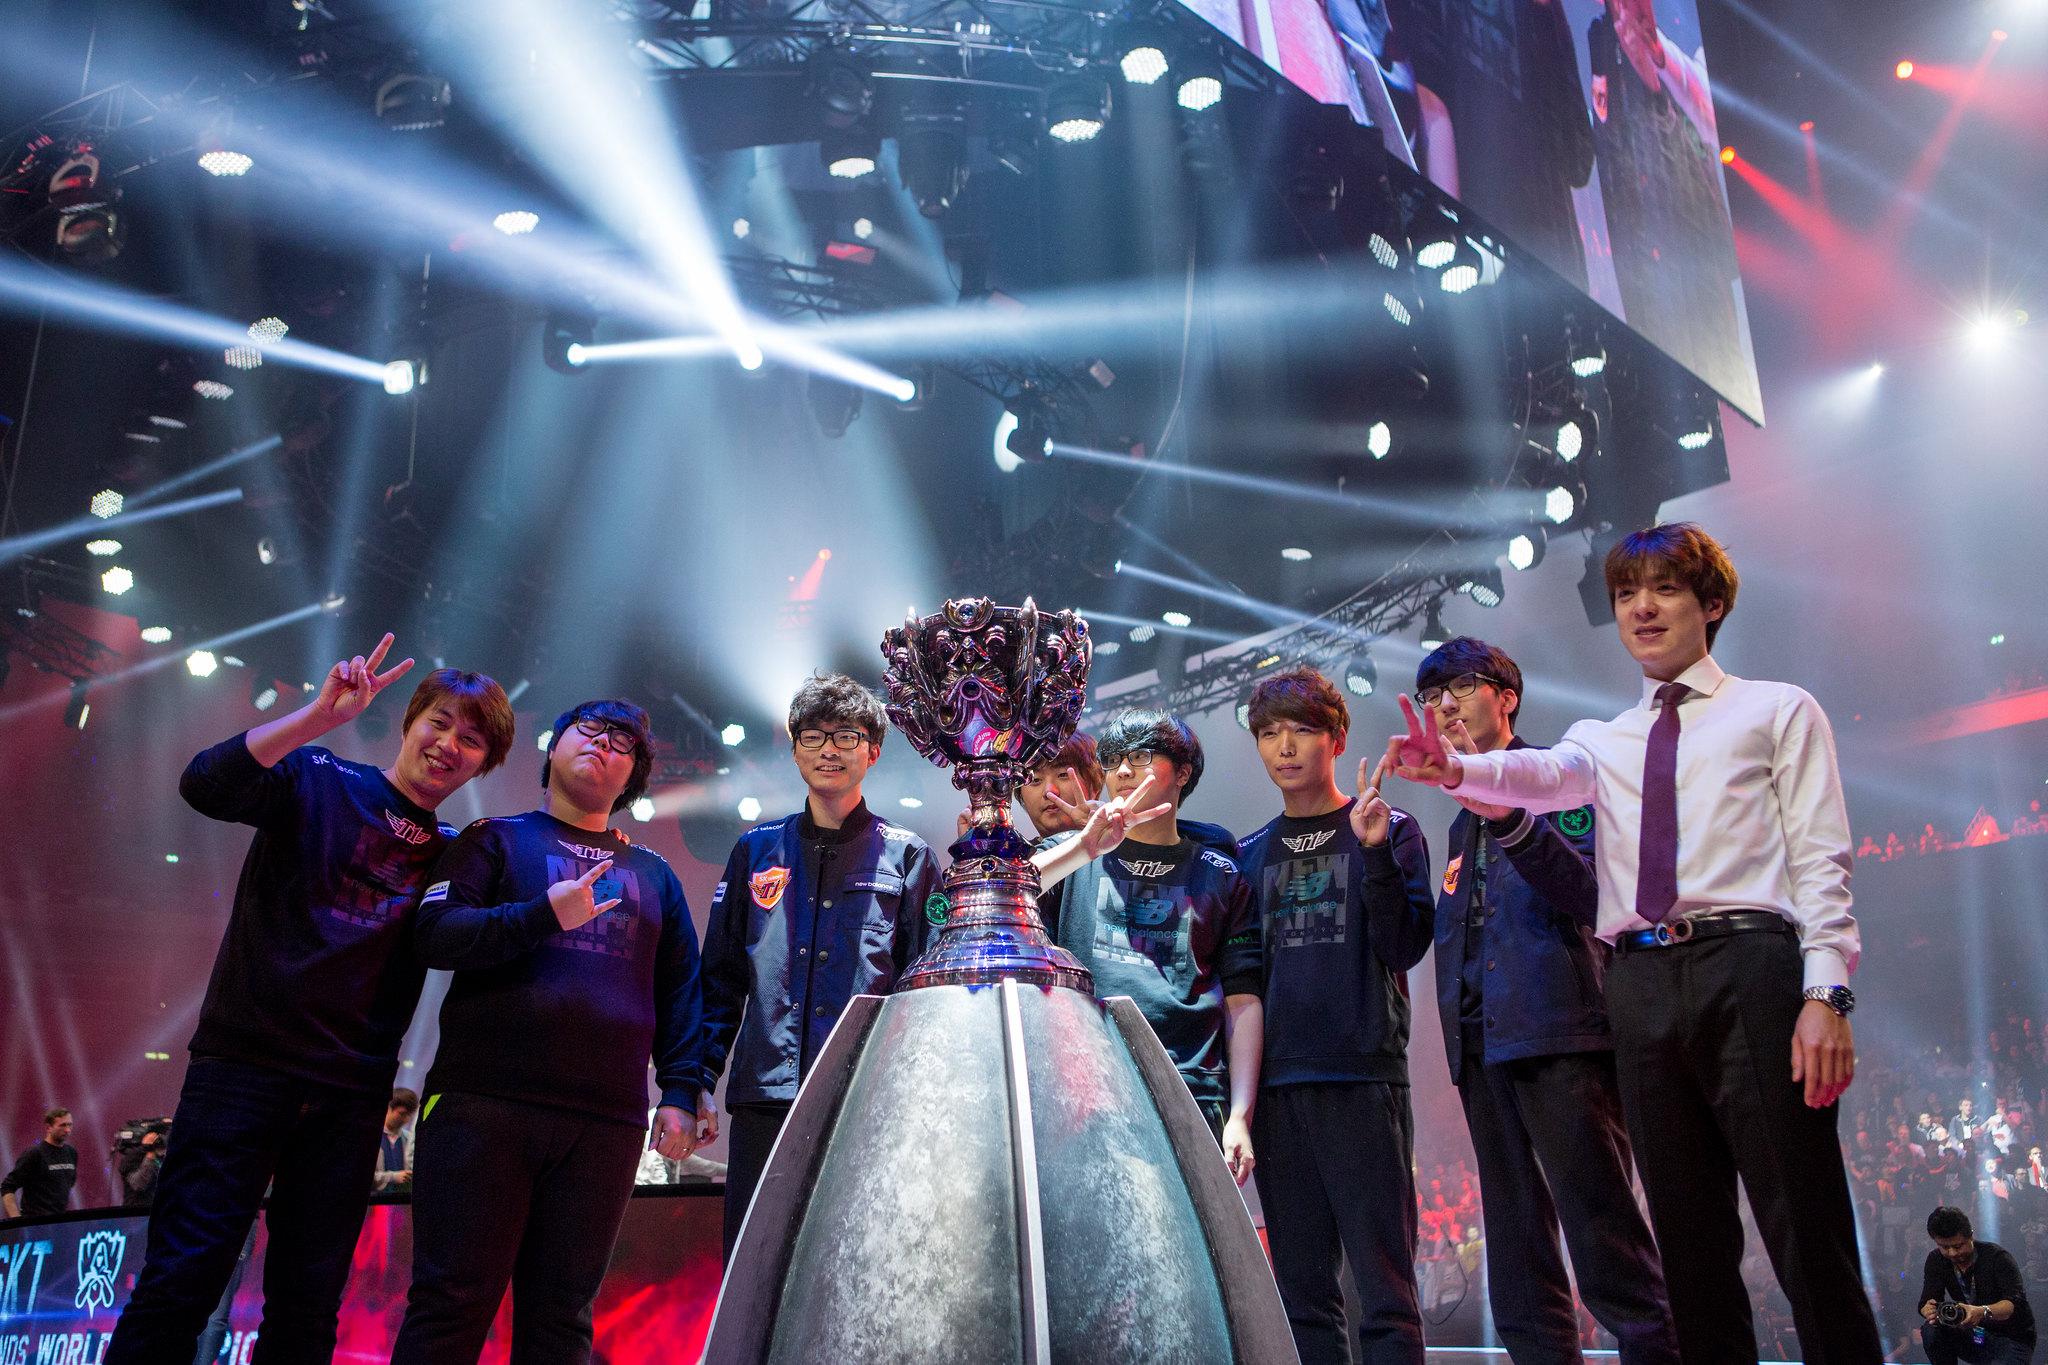 Mundial League of Legends LoL 2015 SK Telecom T1